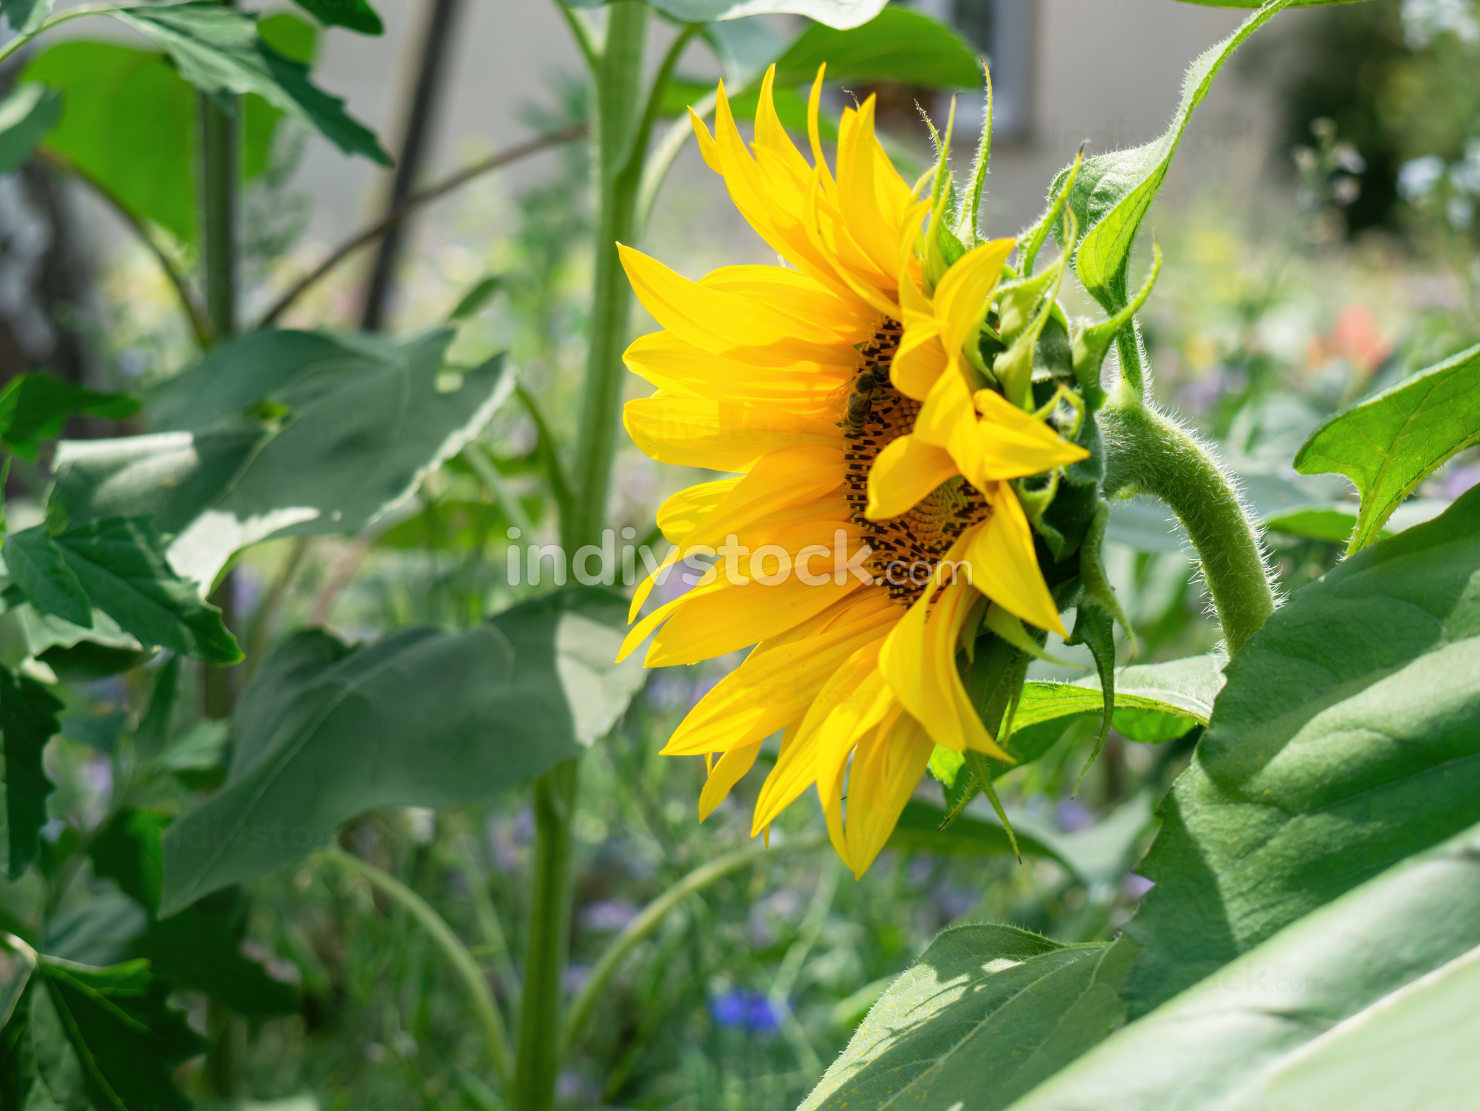 single sunflower in the garden